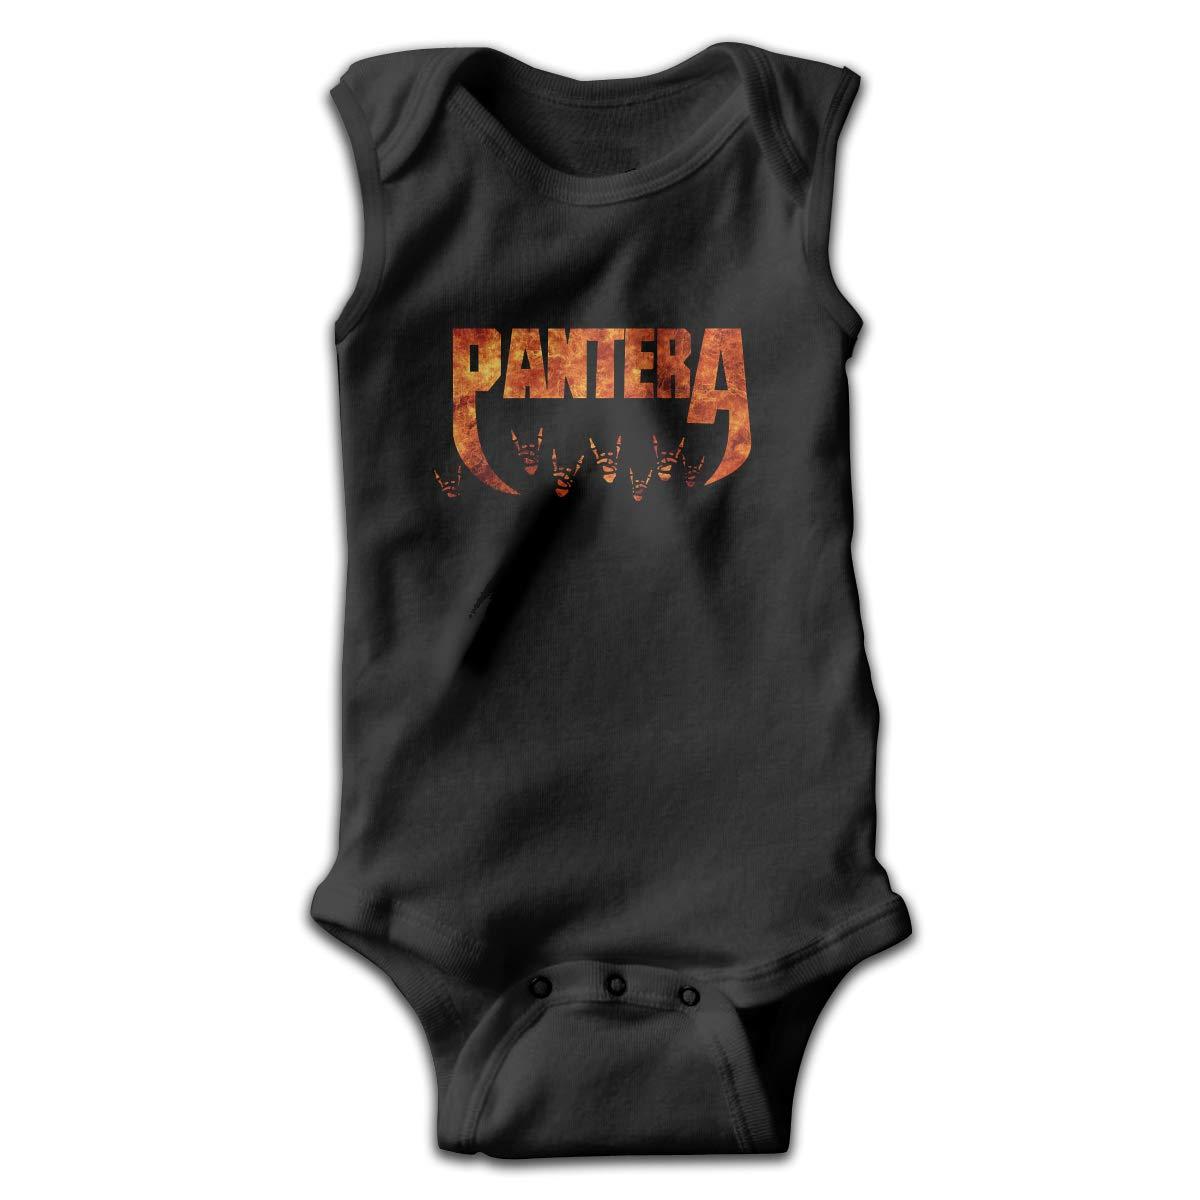 H-Softsneakers Pantera Logo Sleeveless Baby Boys Jumpsuit Cute Onesie Summer Bodysuits